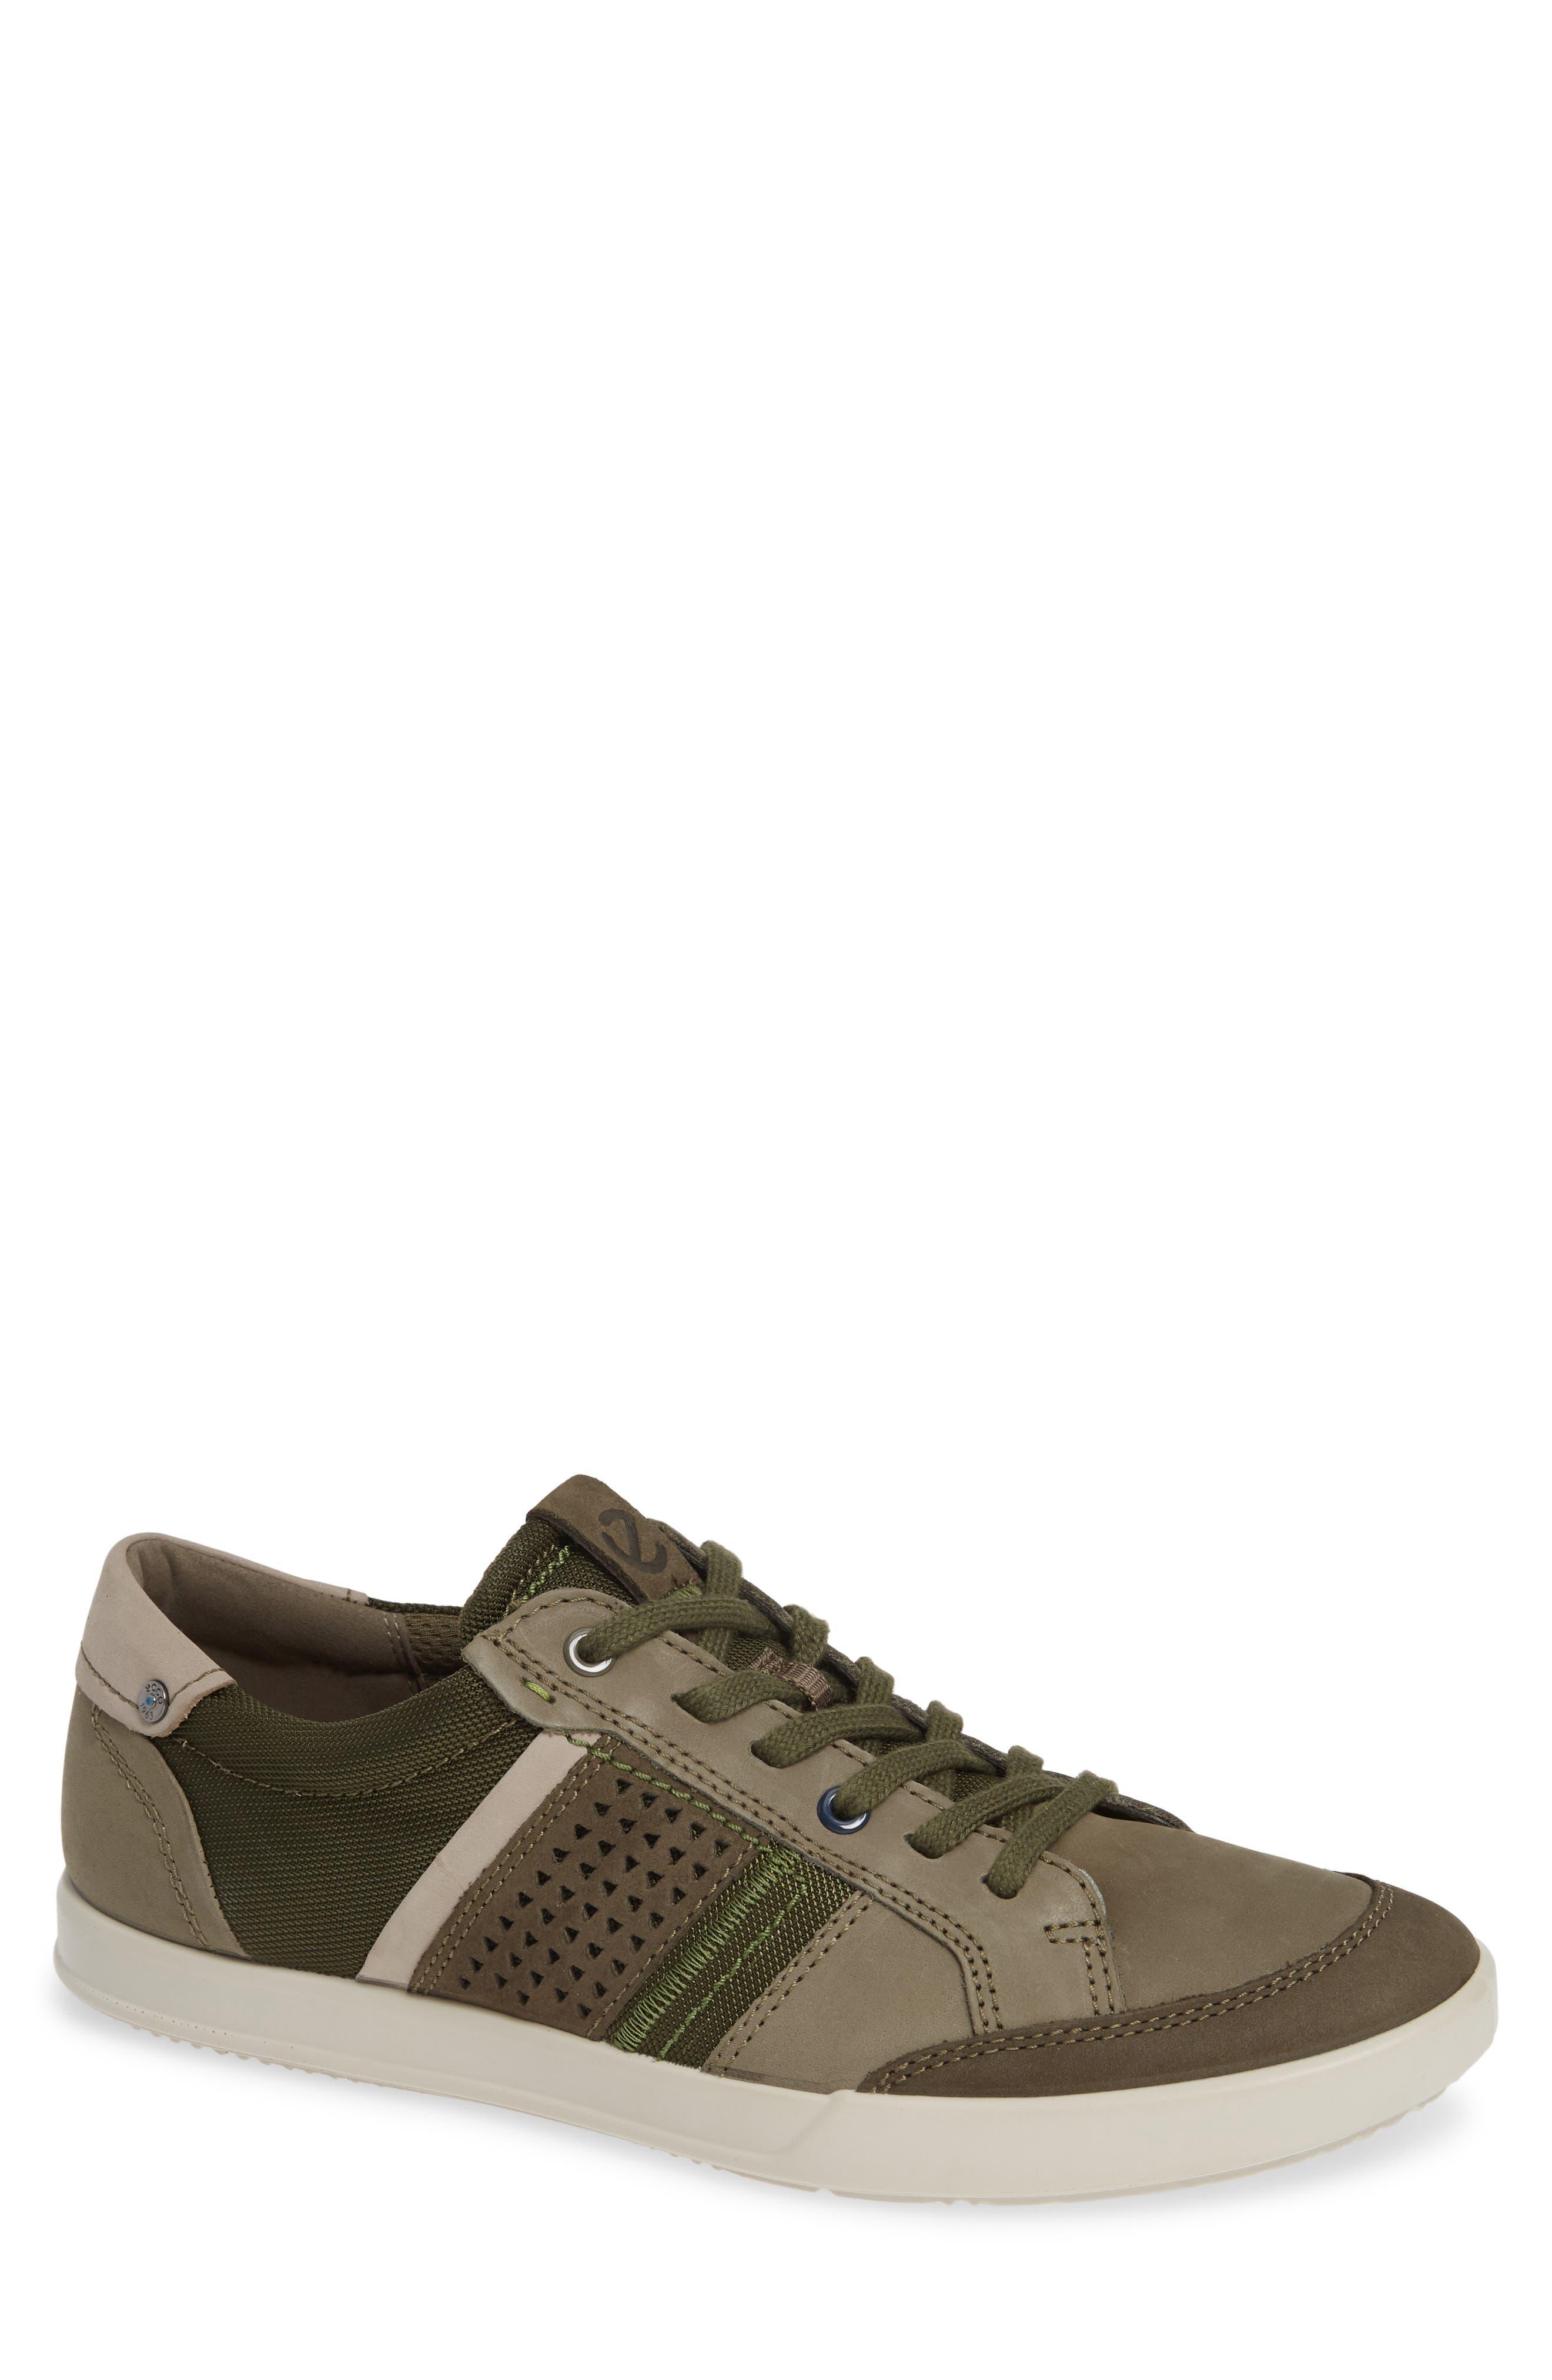 ECCO, Collin 2.0 Sneaker, Main thumbnail 1, color, TARMAC LEATHER